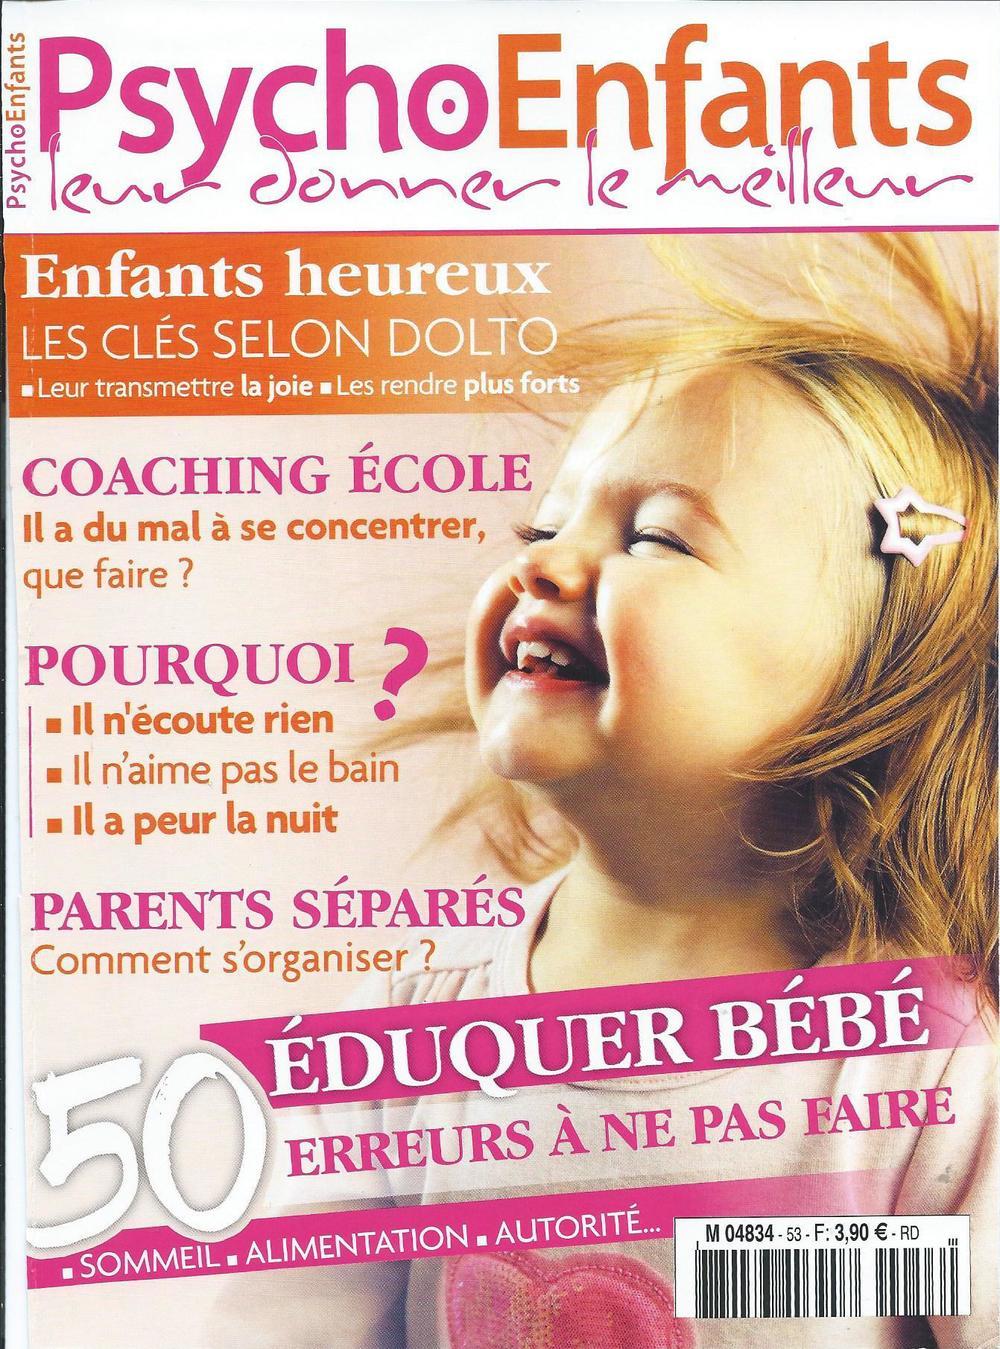 PSYCHO ENFANTS Couv Avril Mai  2014.jpg